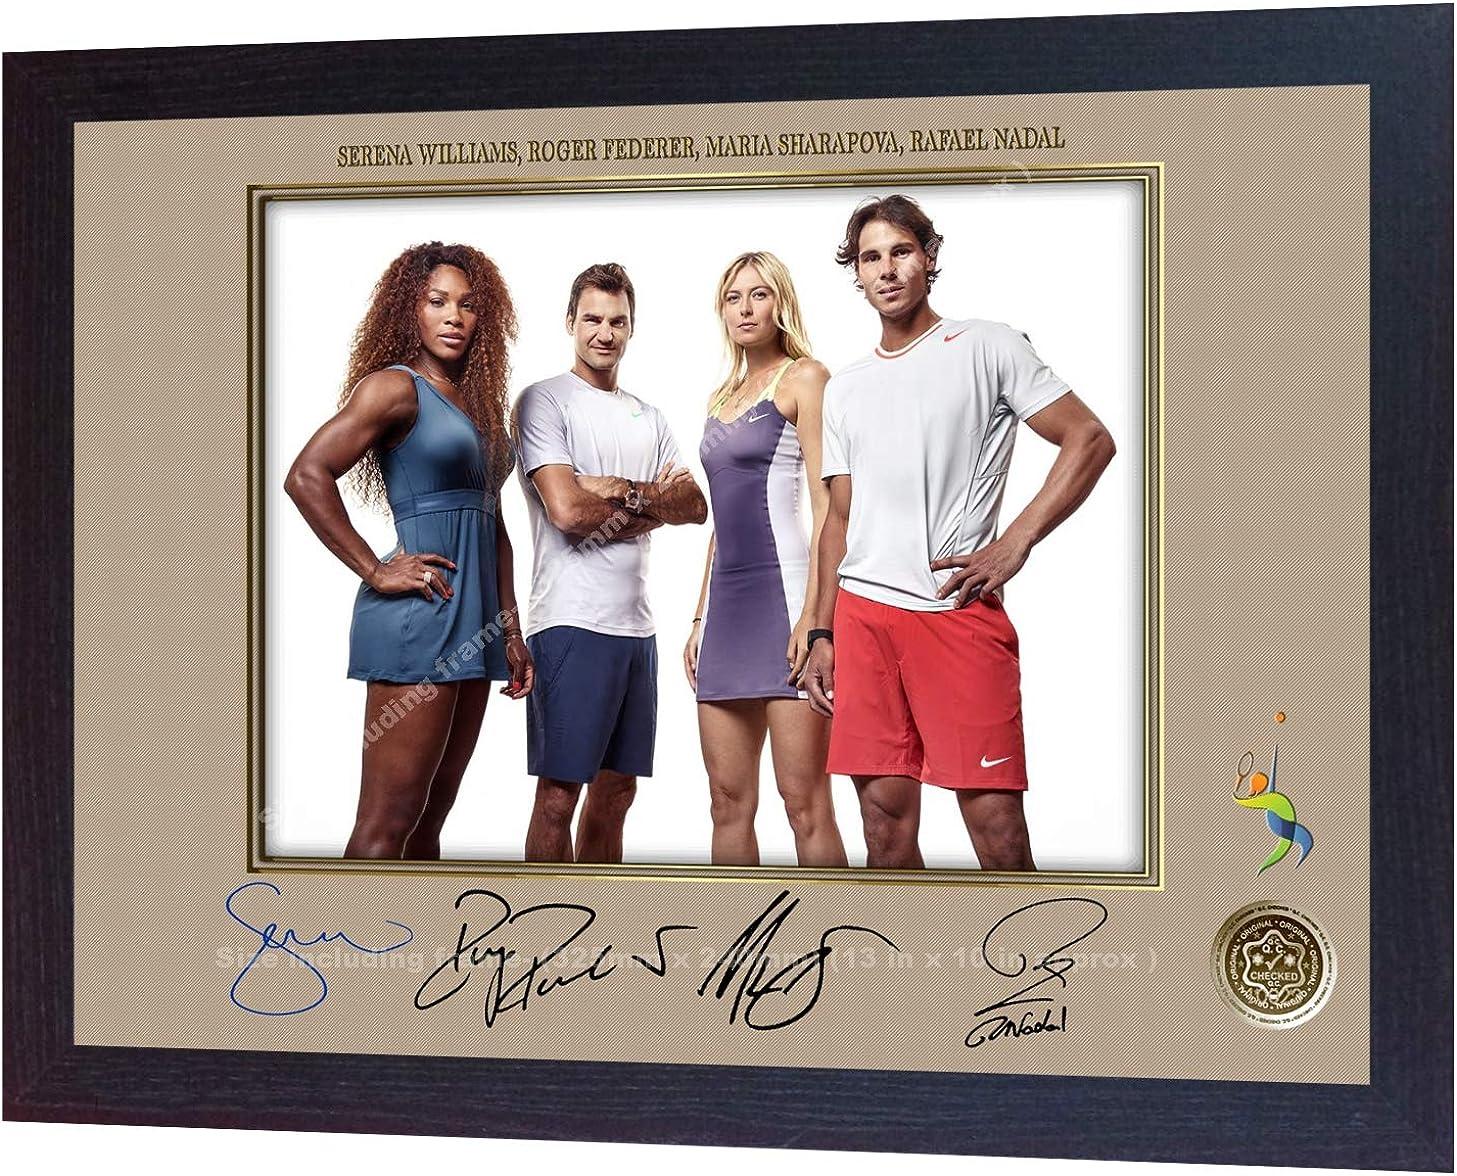 Amazon Com S E Desing Roger Federer Rafael Nadal Serena Williams Maria Sharapova Signed Photo Framed Clothing